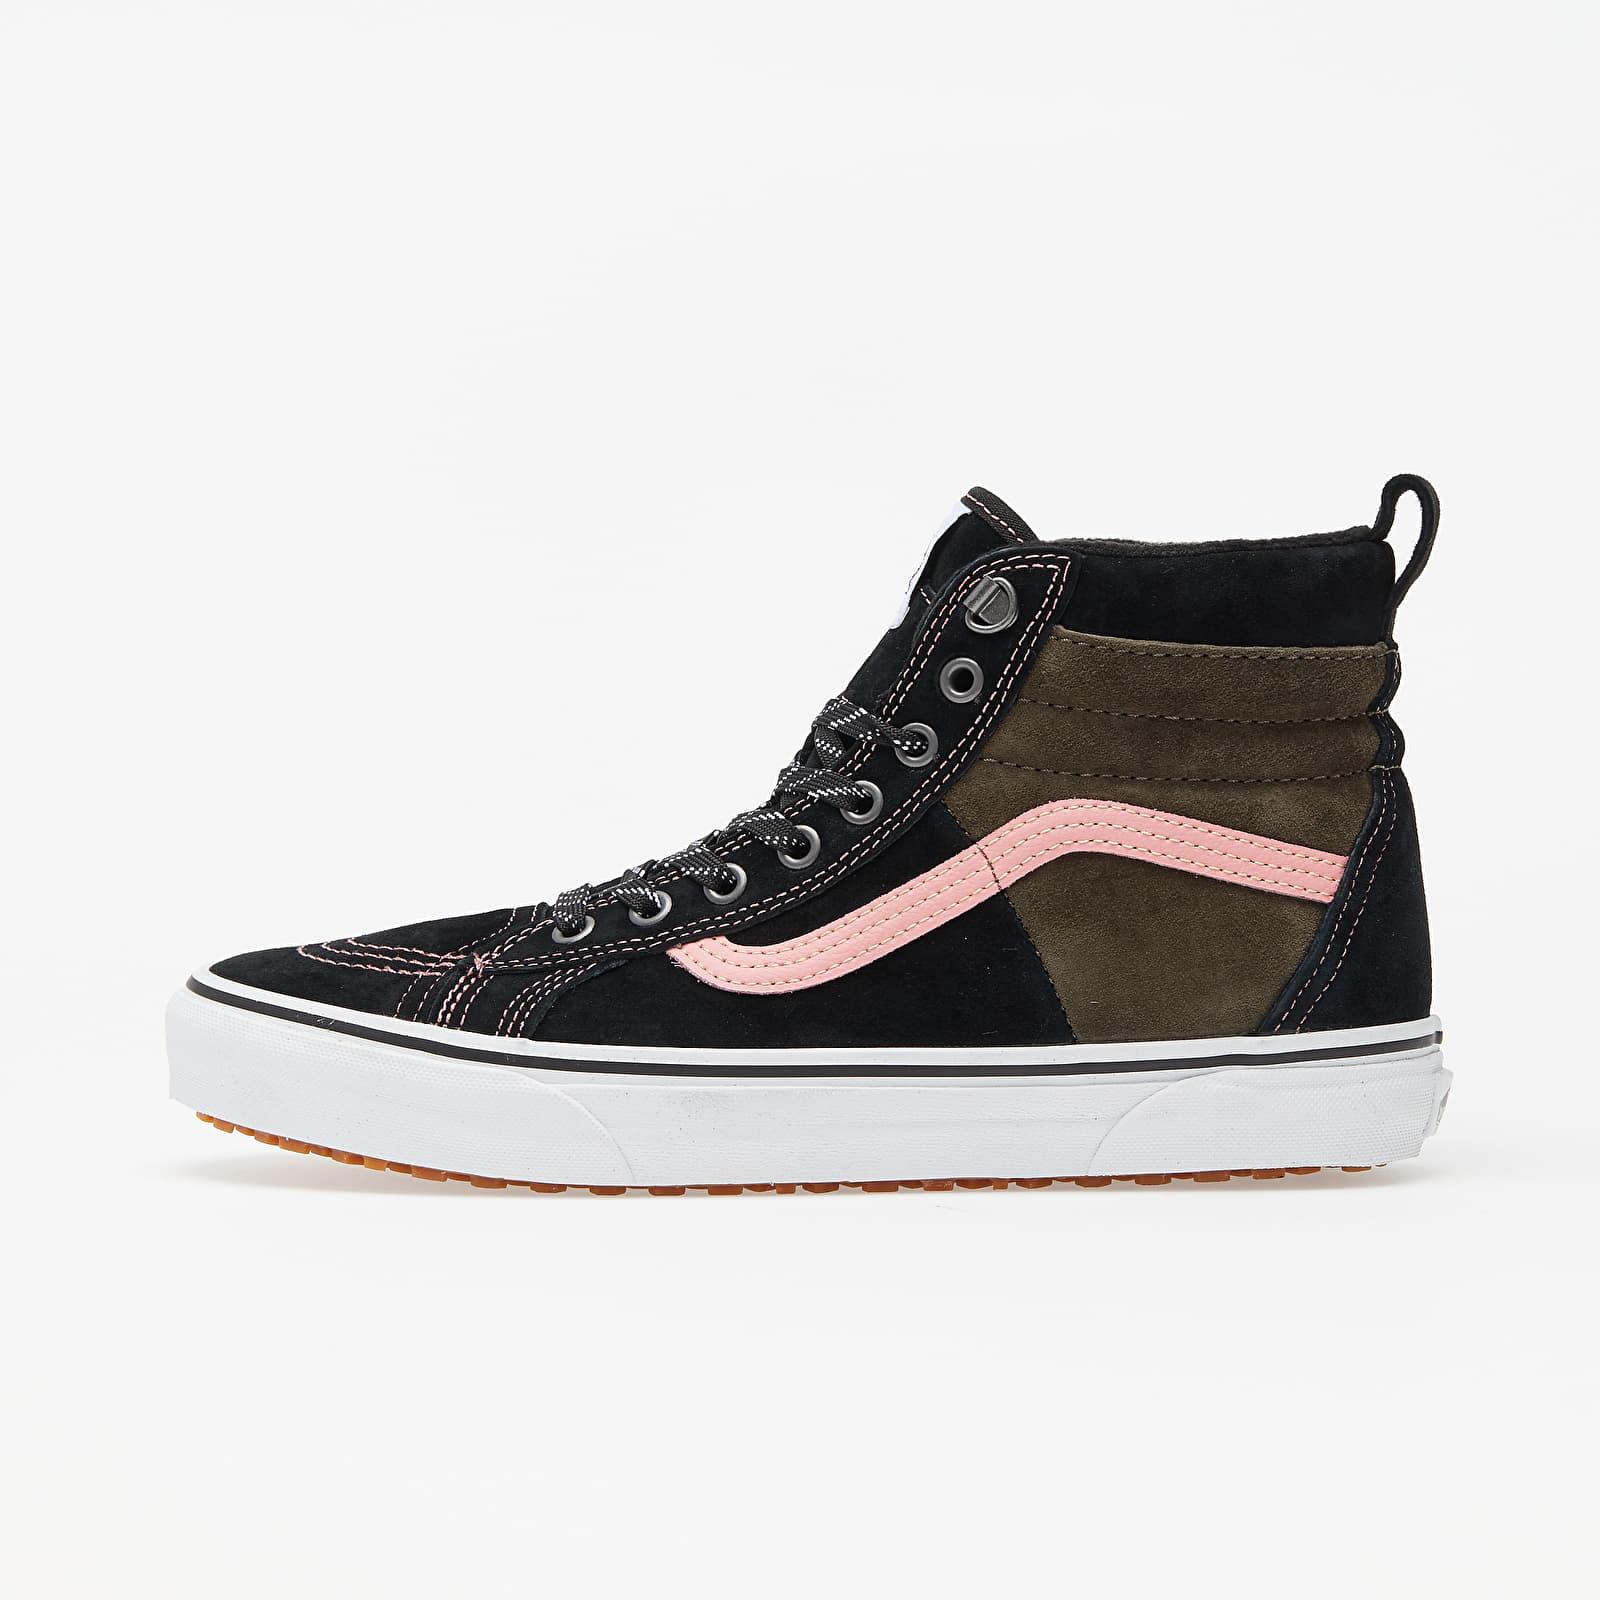 Men's shoes Vans Sk8-Hi 46 MTE DX (MTE) Paracord/ Canteen